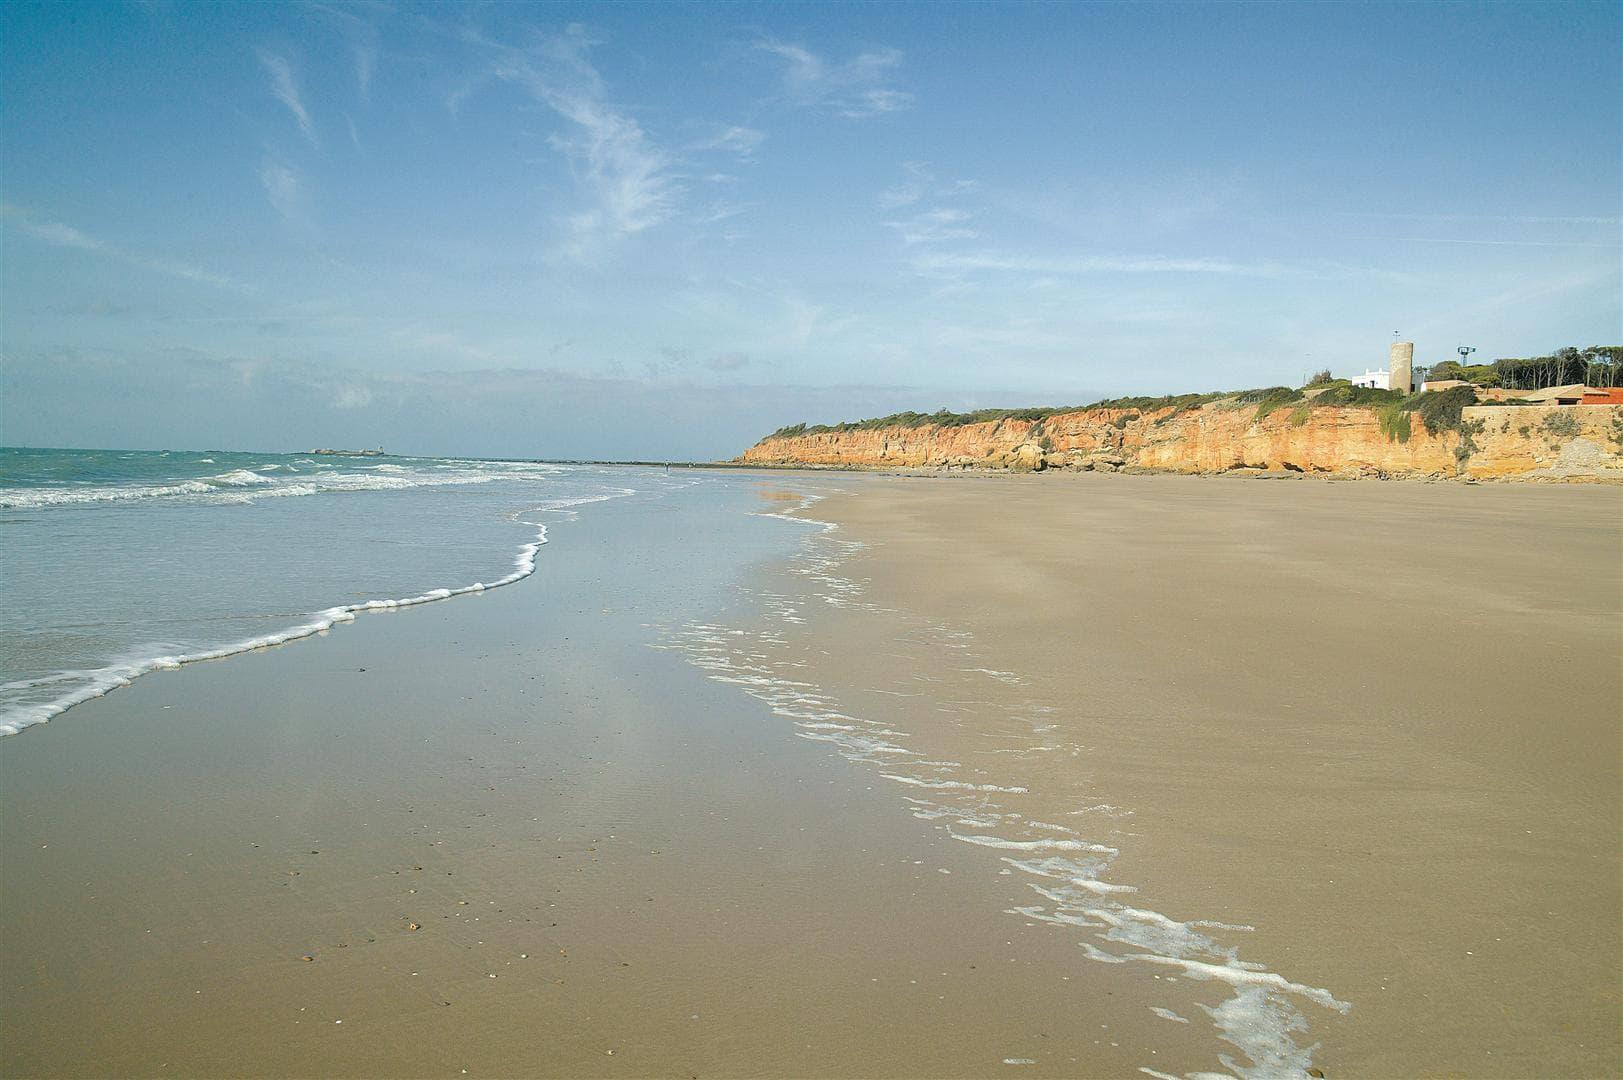 arena de la Playa de la barrosa